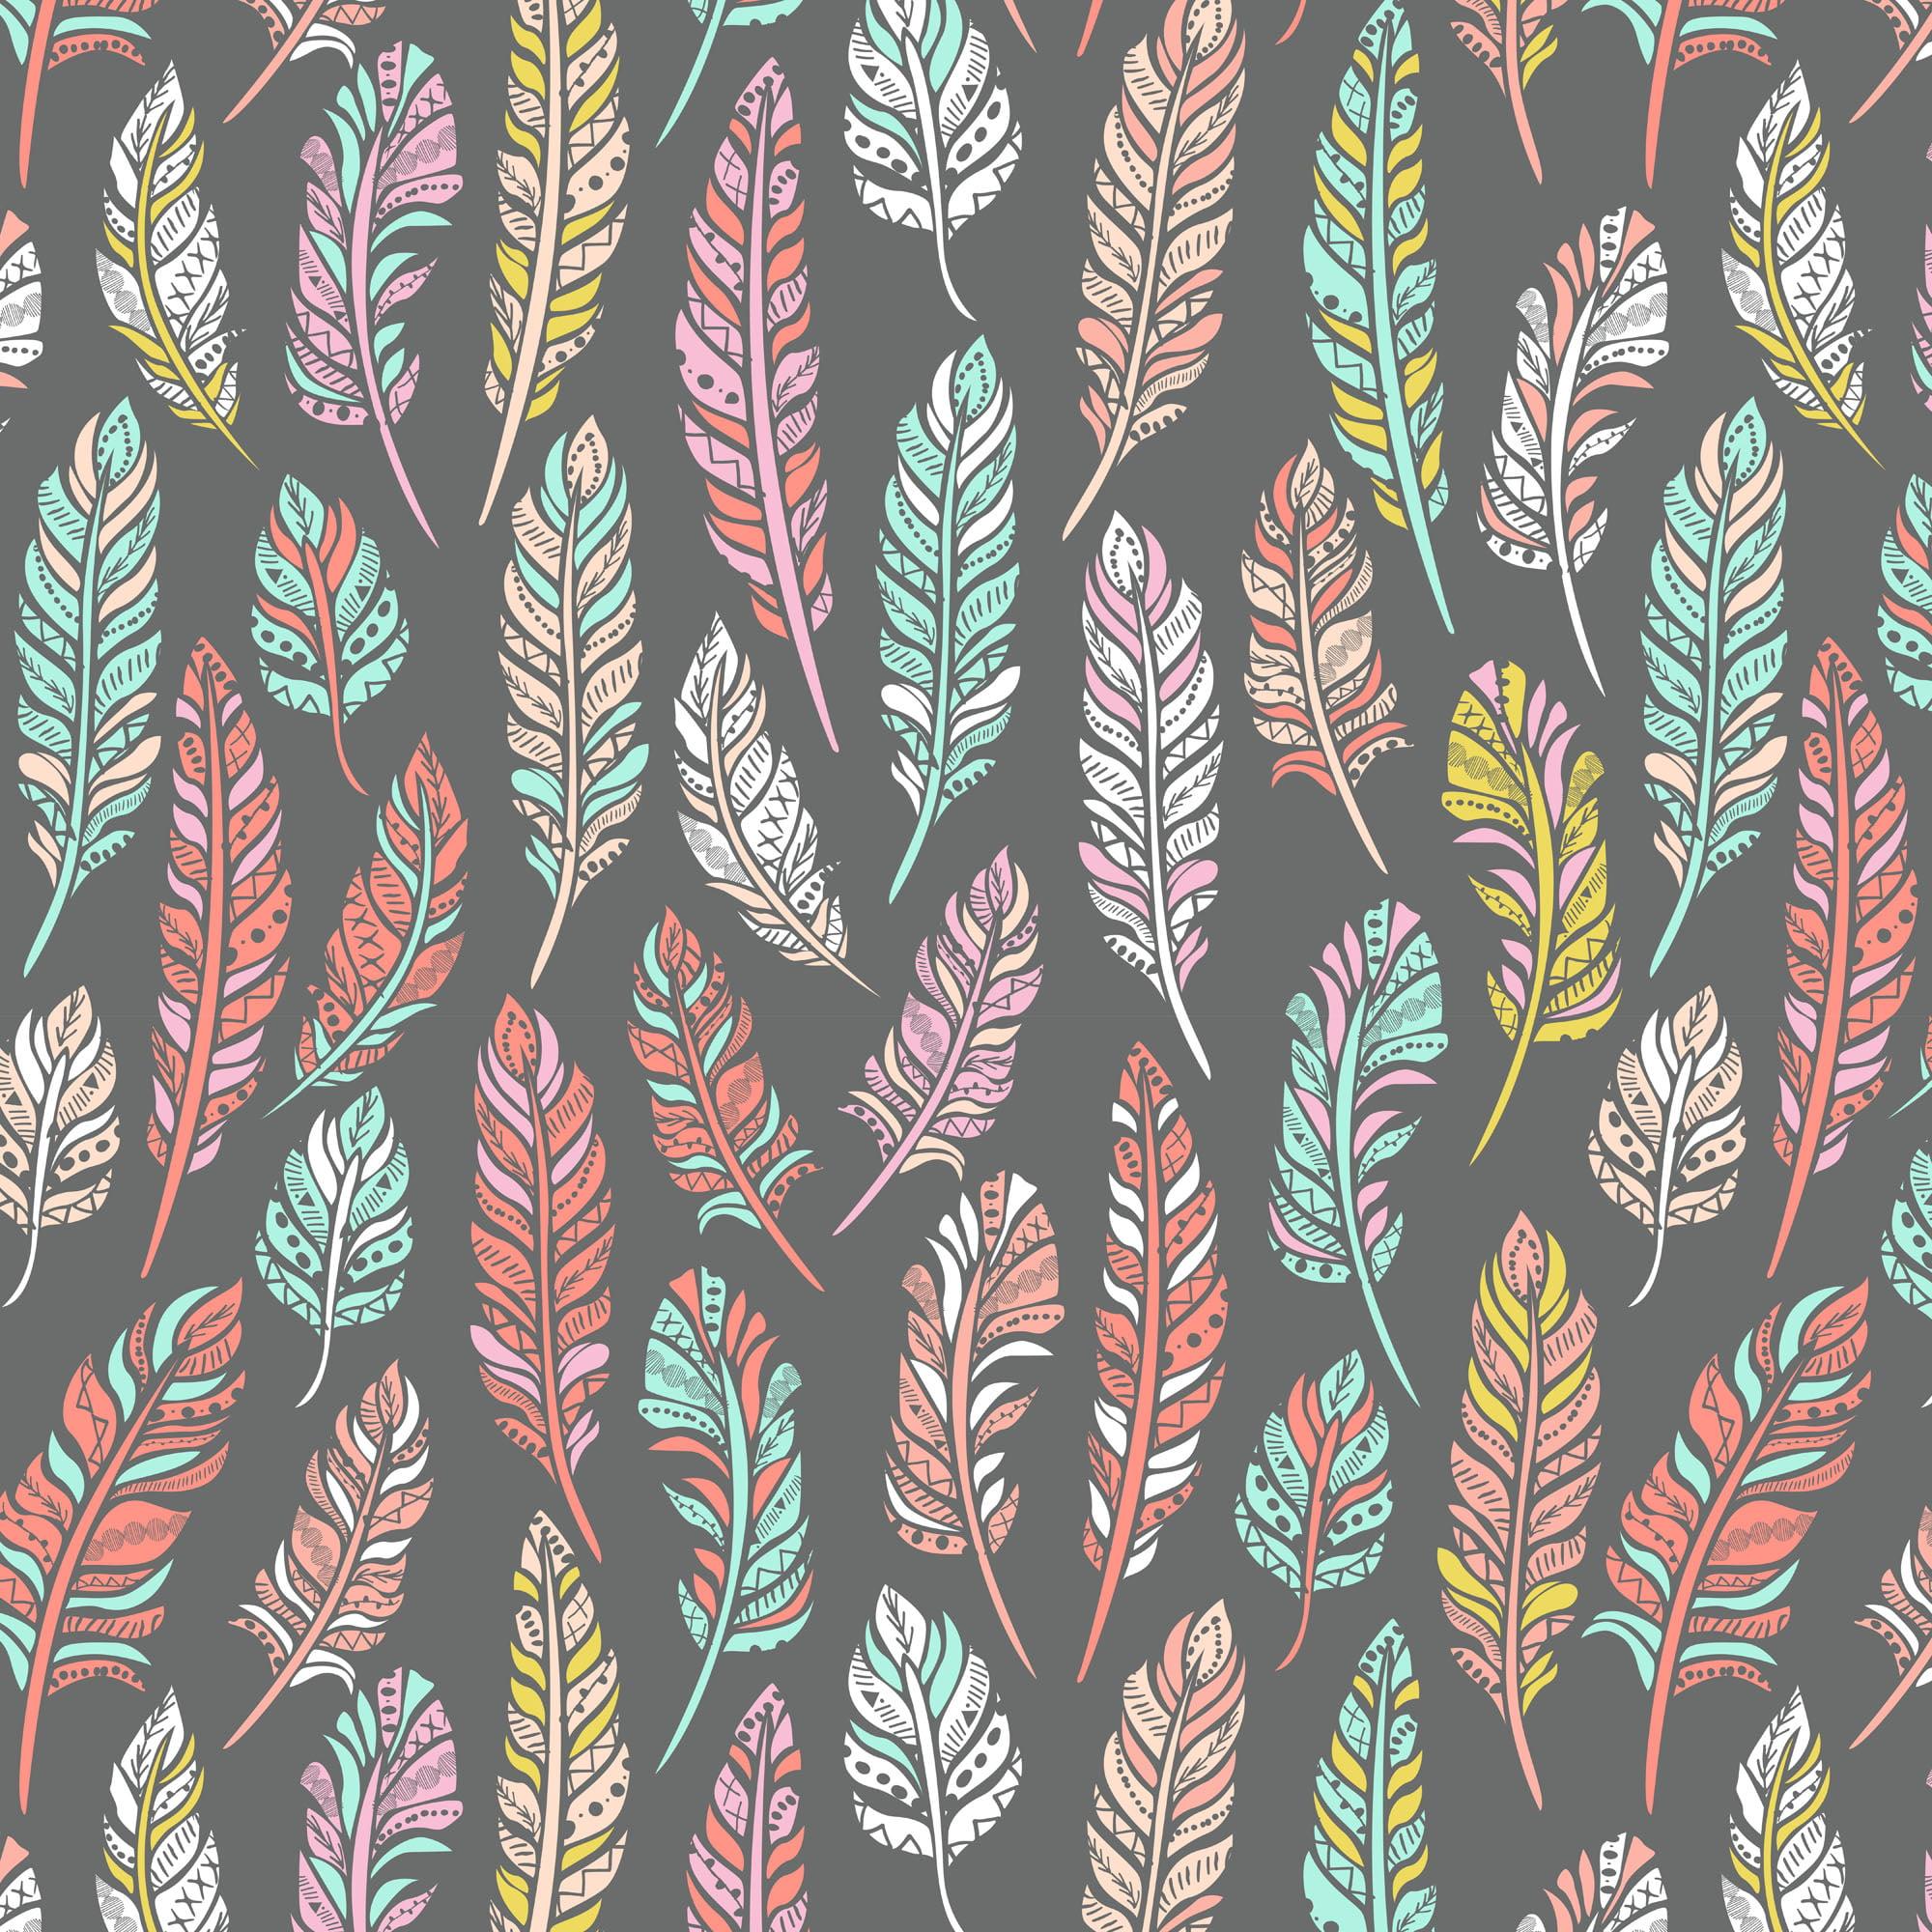 David Textiles Anti-pill Fleece Precut Fabric Ethnic Feathers 1.5 Yds X 60 Inches